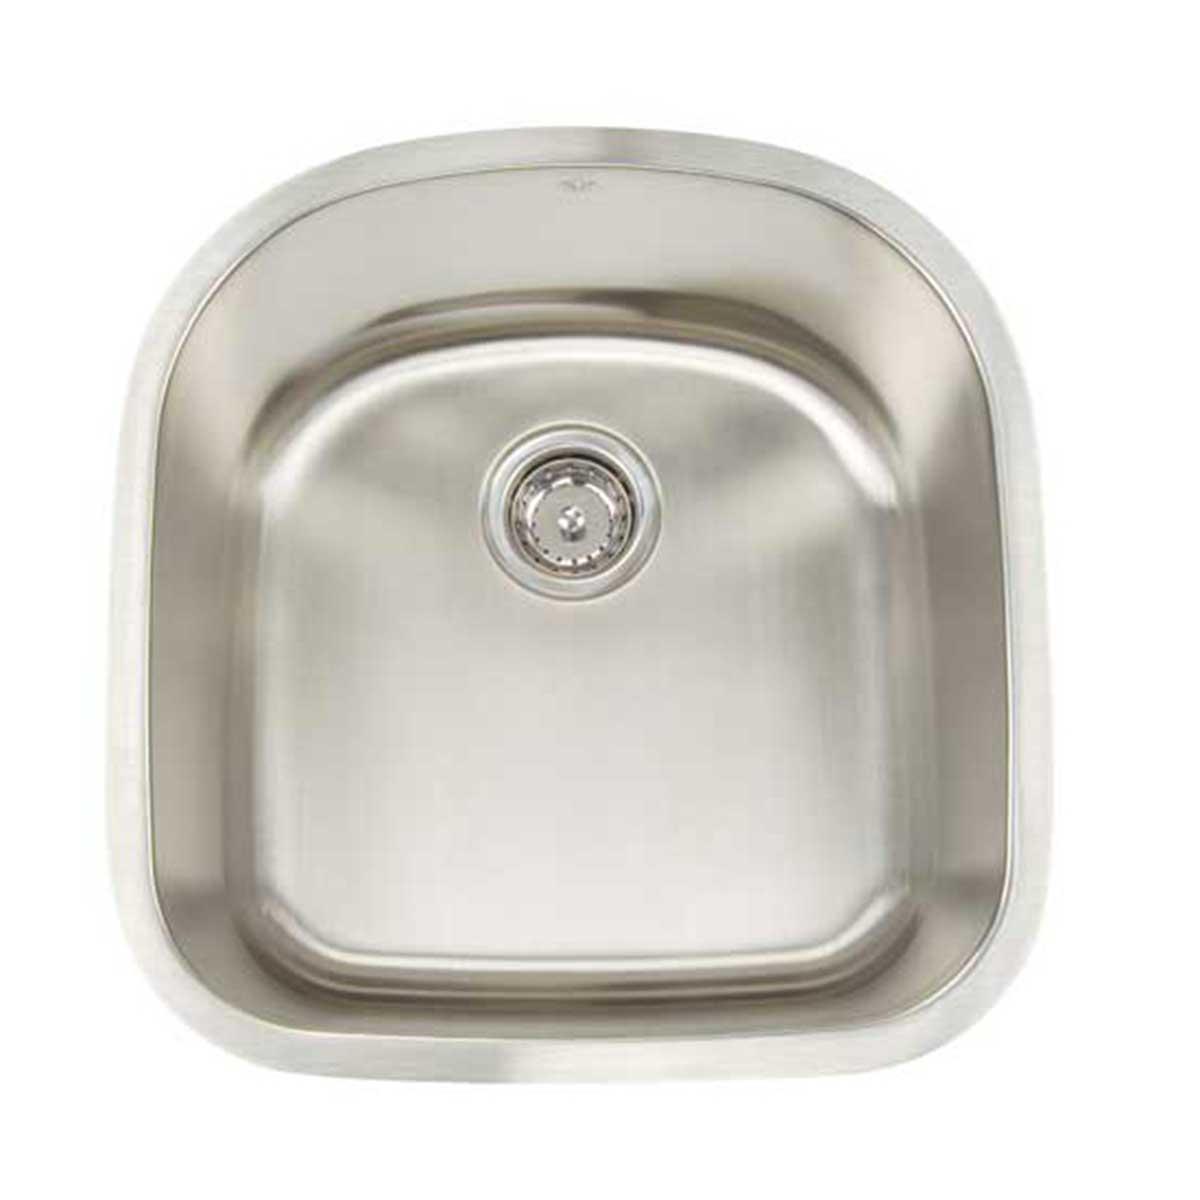 ar2120d9 d artisan sinks     artisan kitchen sinks ar2120d9 d  contractors direct   rh   contractorsdirect com